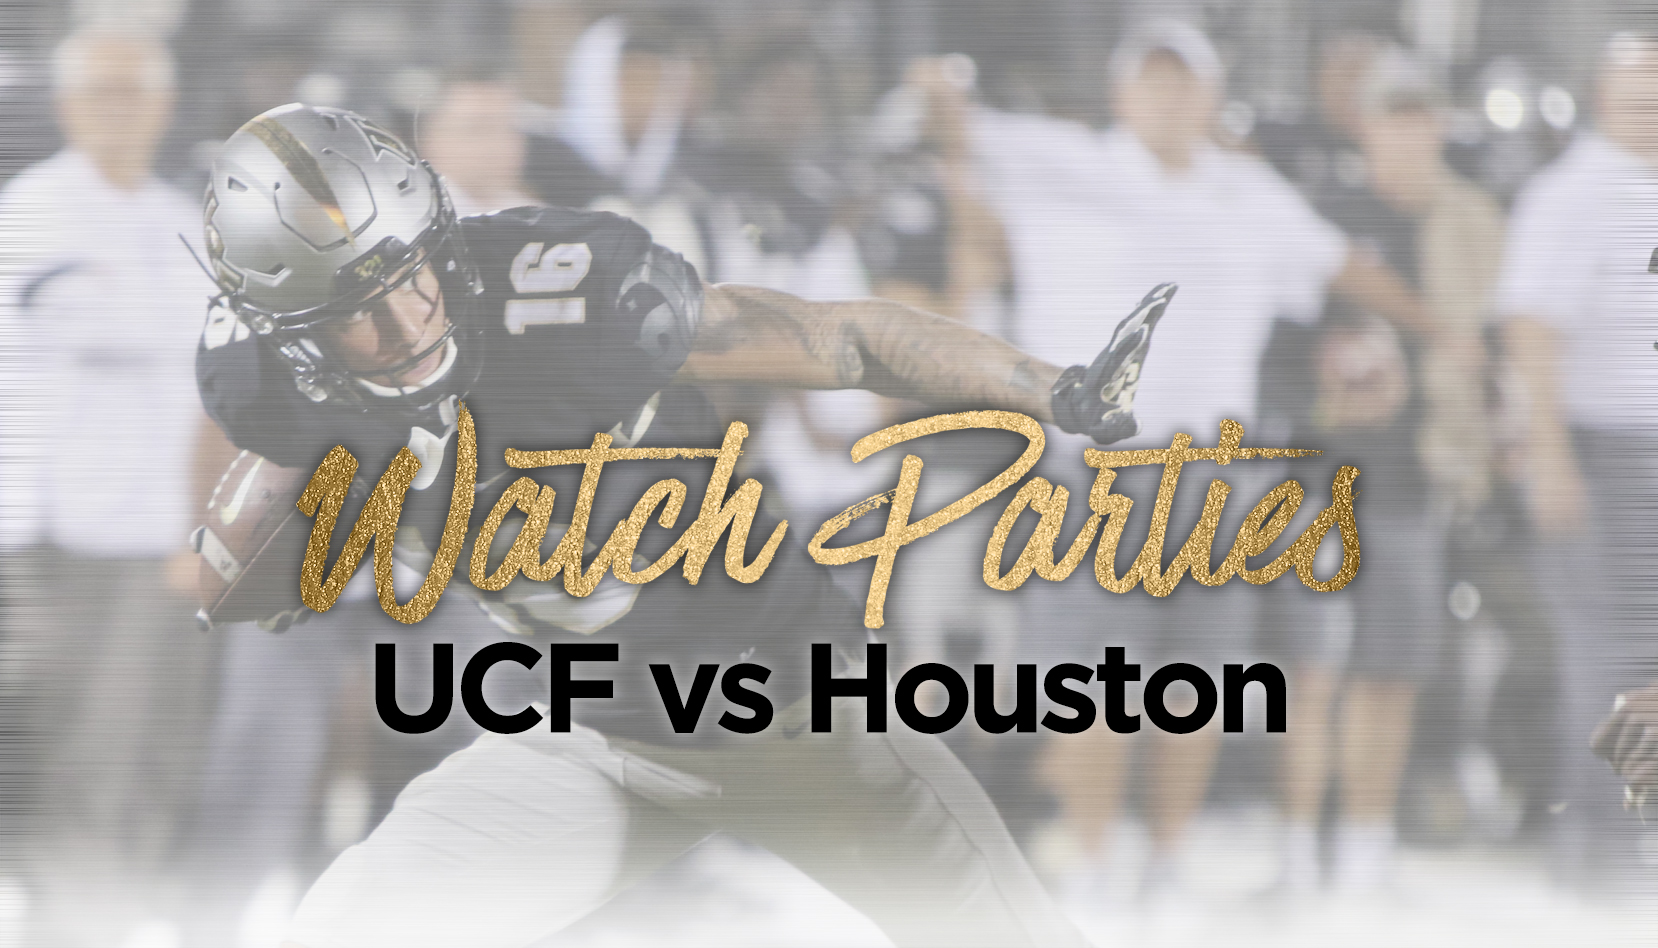 UCF vs. Houston Watch Parties